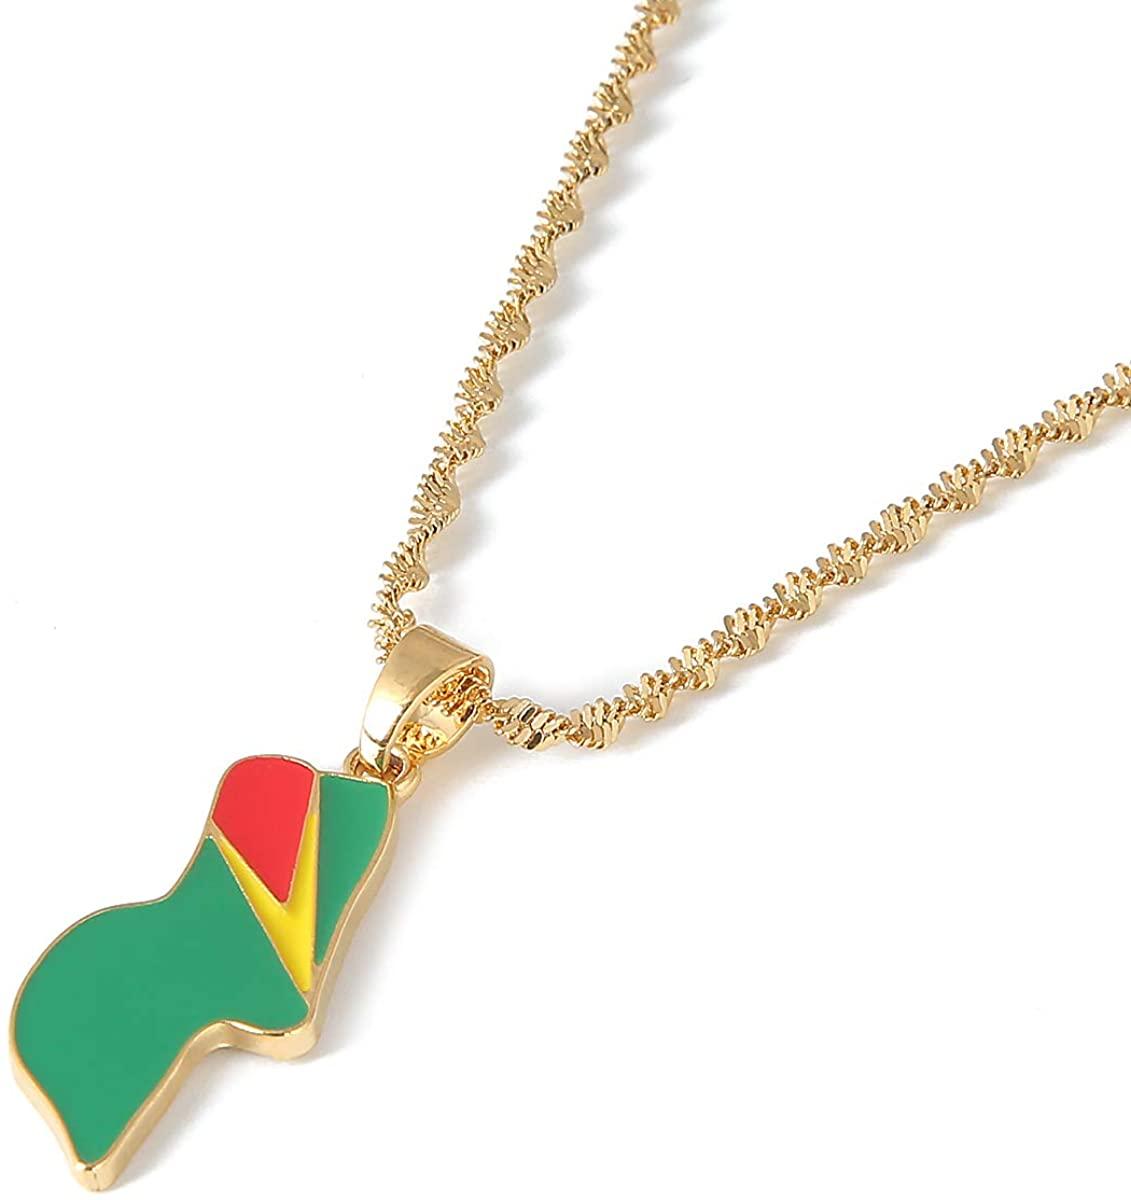 Enamel Guyana Pendant Necklaces Jewellery Gold Color Jewelry Guyana Flag Jewelry